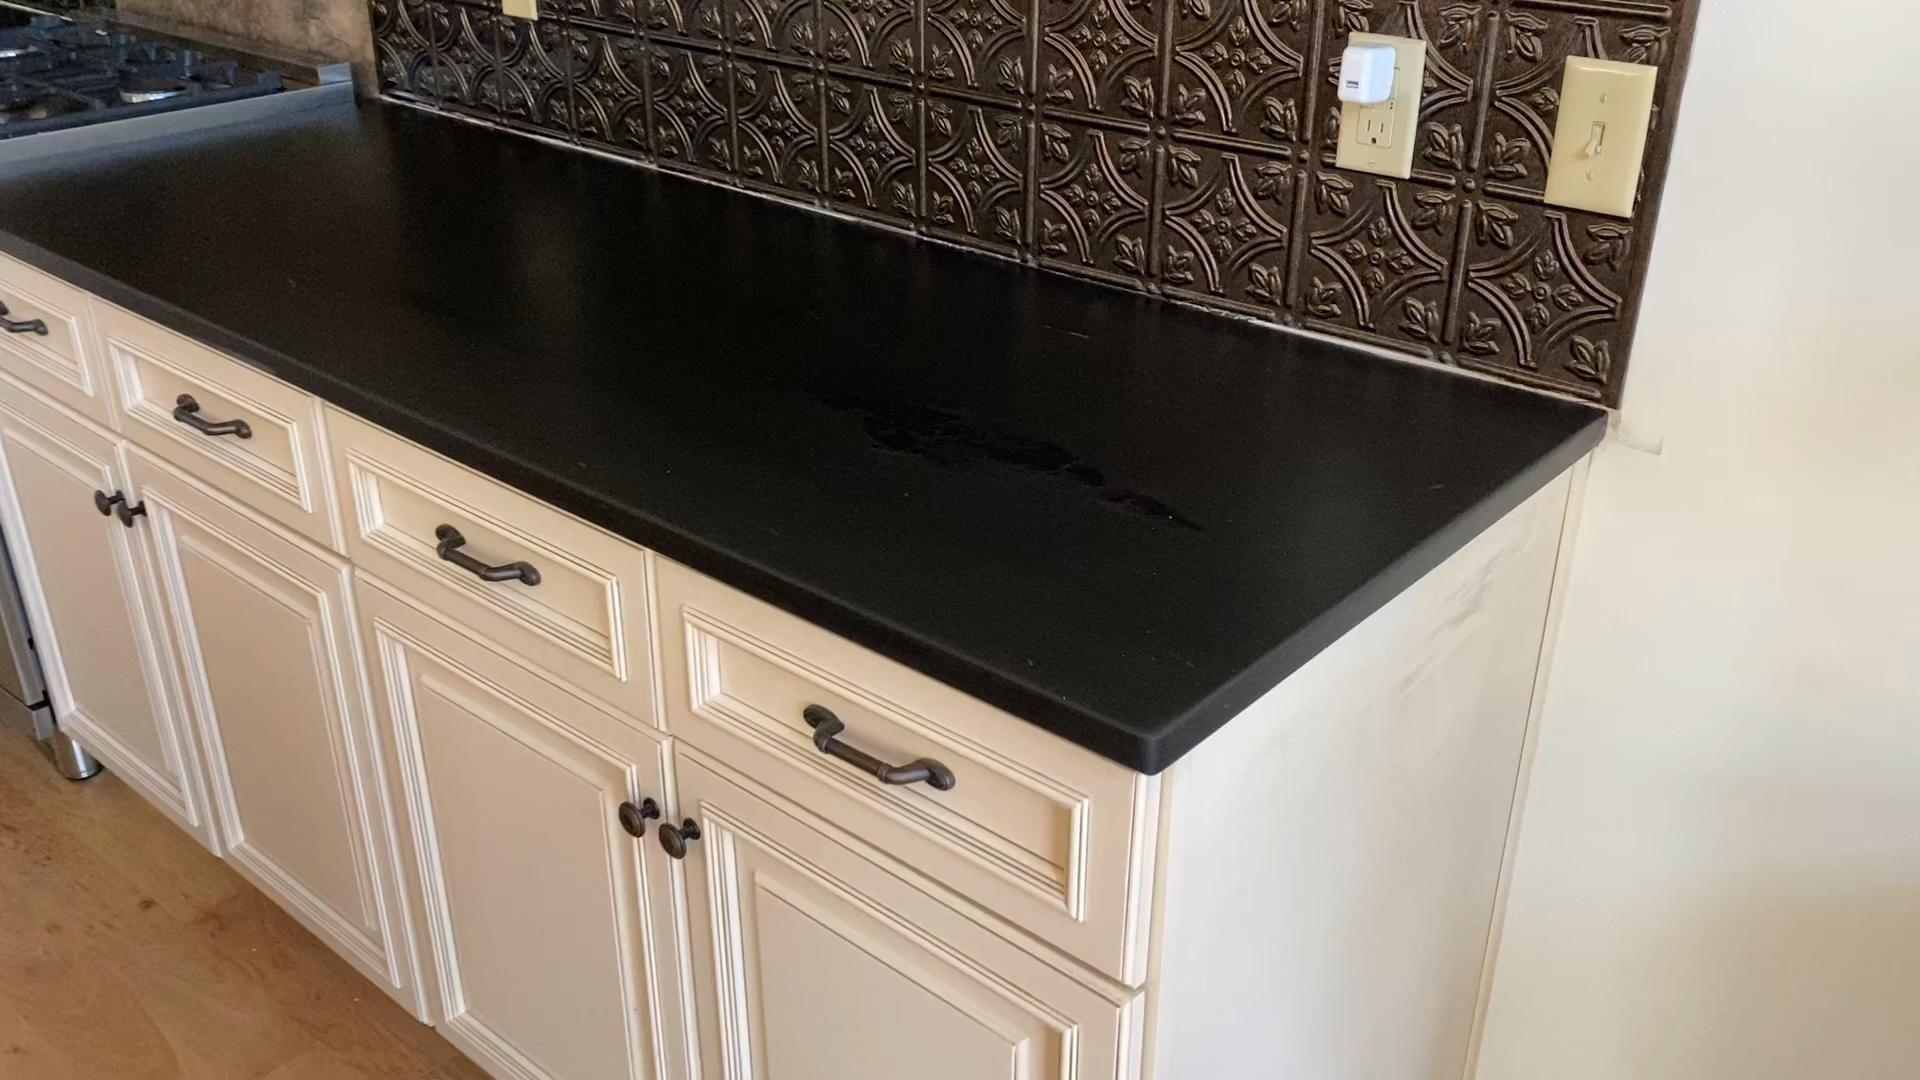 Valongo Black Slate Kitchen Counter Video Slate Kitchen Countertops Diy Countertops